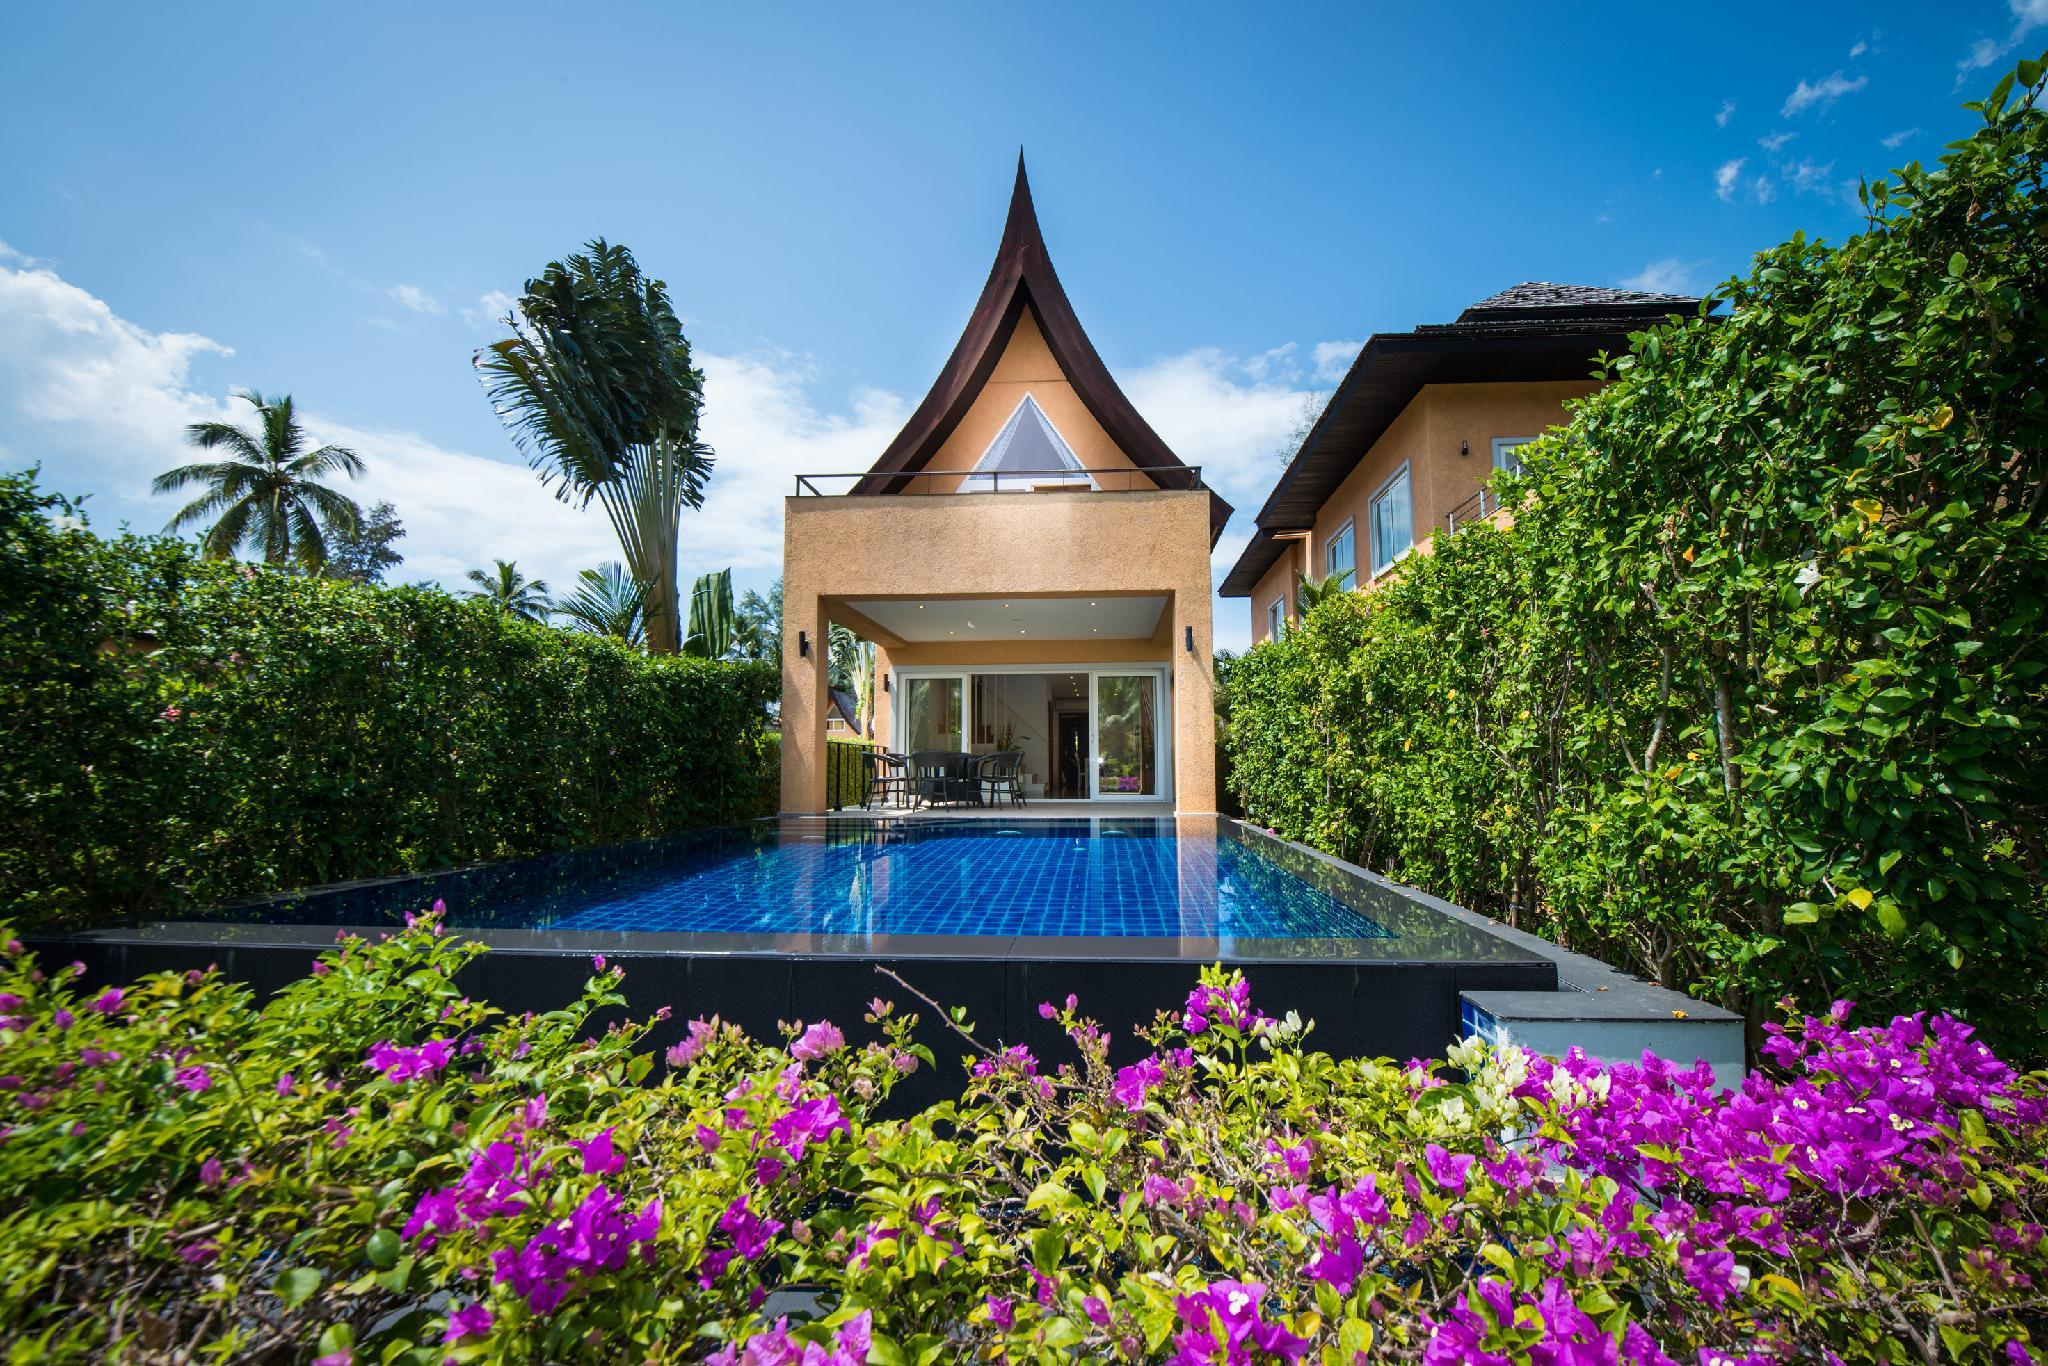 Blue Chill Villa  Infinity Pool  Hotel Managed วิลลา 3 ห้องนอน 4 ห้องน้ำส่วนตัว ขนาด 200 ตร.ม. – คลองสน